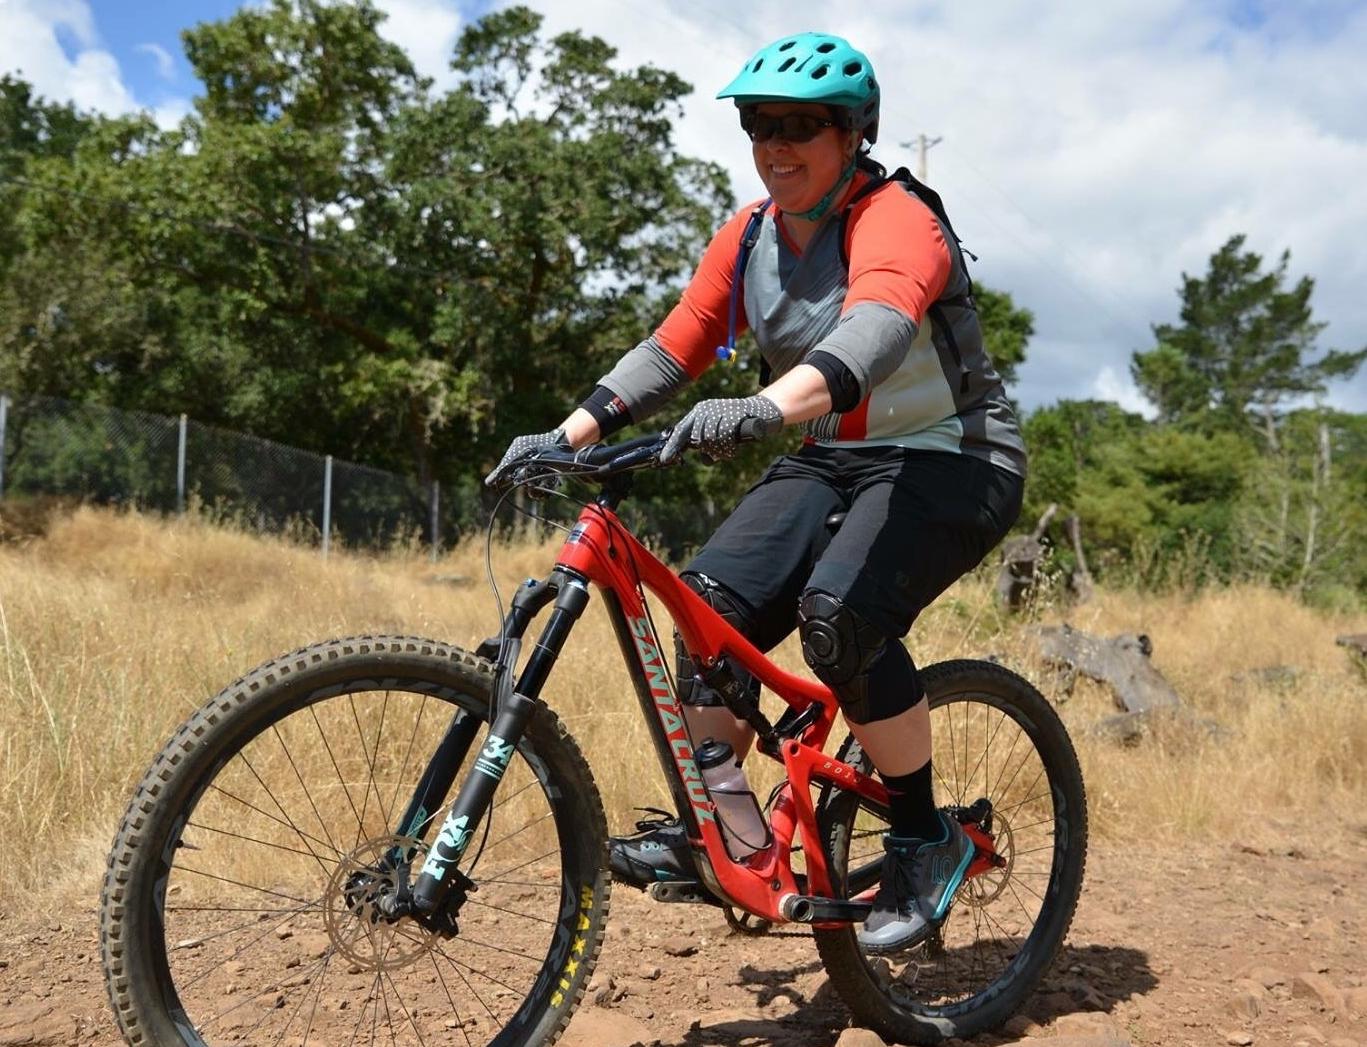 Alyson at a recent  Bell Joy Ride Santa Rosa  event at Annadel State Park.